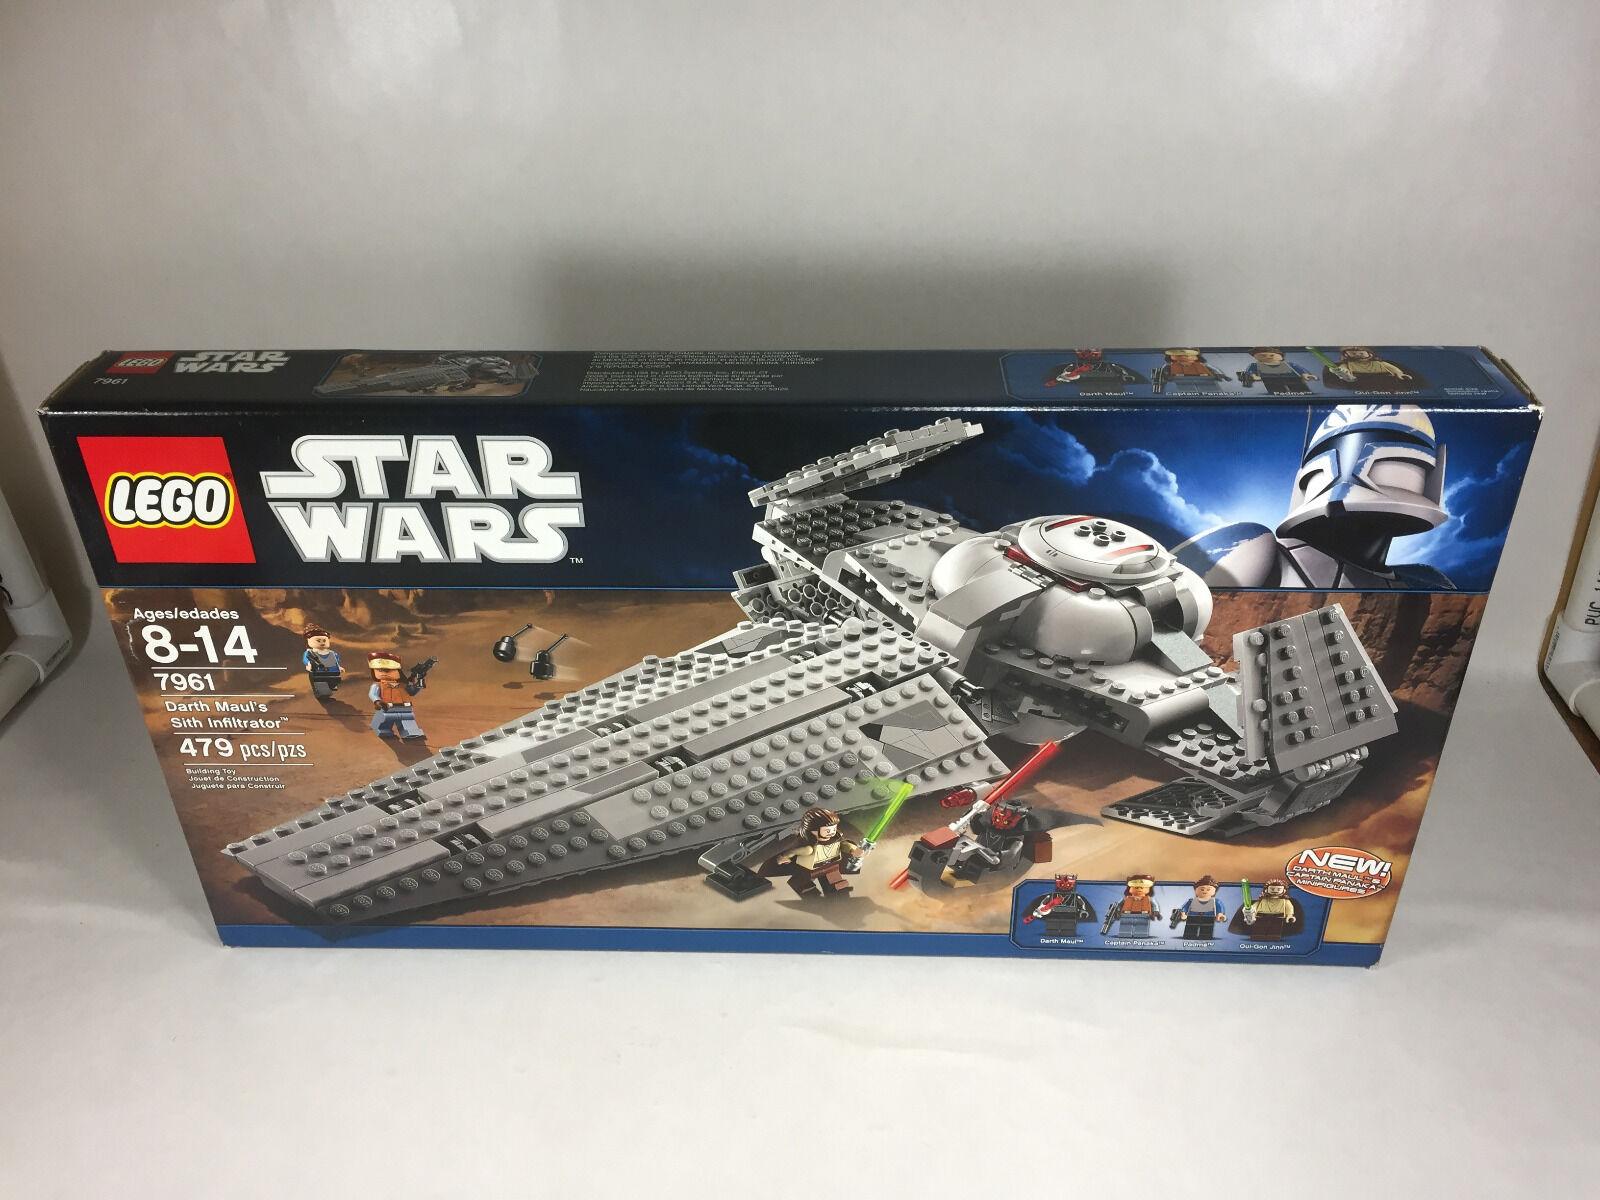 LEGO STAR WARS DARTH MAUL'S SITH INFILTRTOR 7961